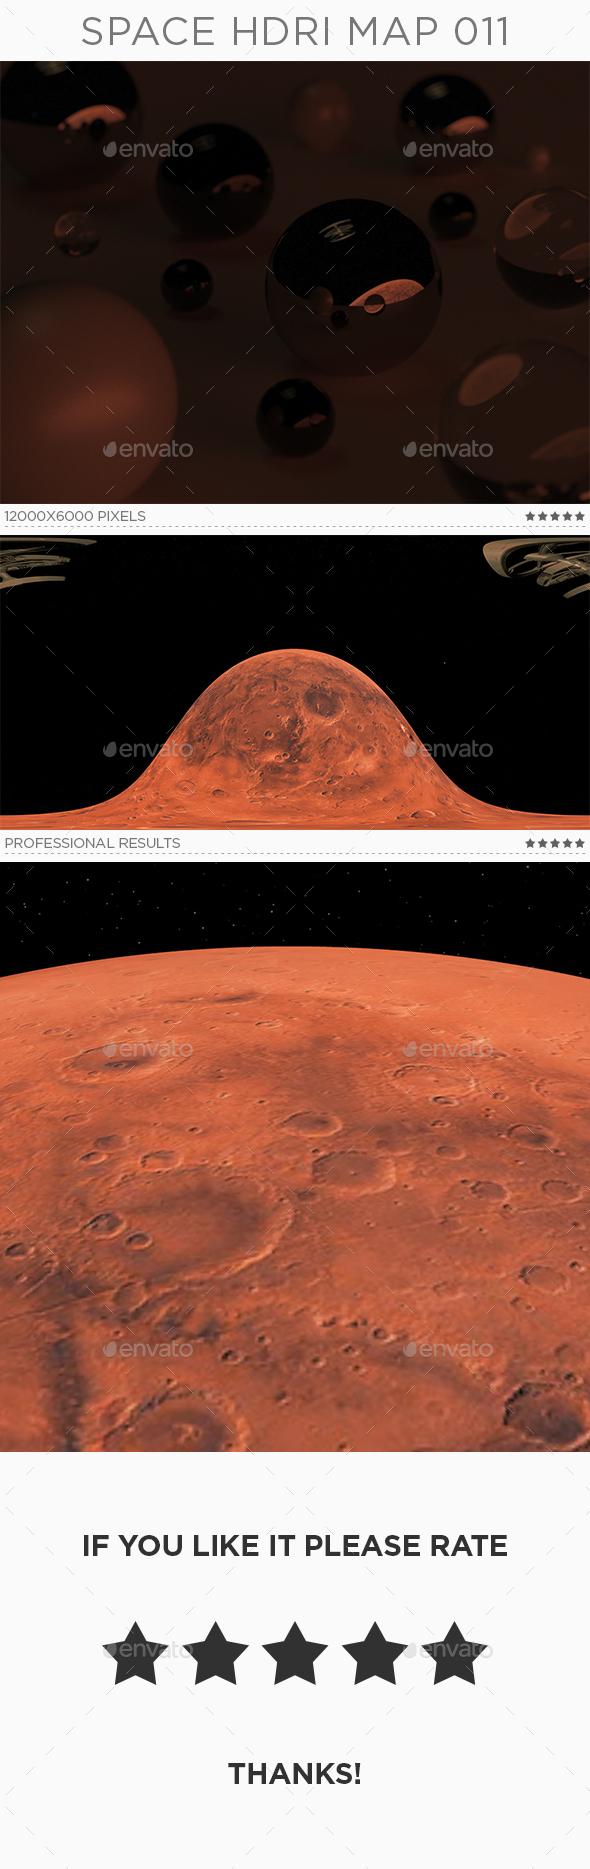 Space HDRi Map 011 - 3DOcean Item for Sale